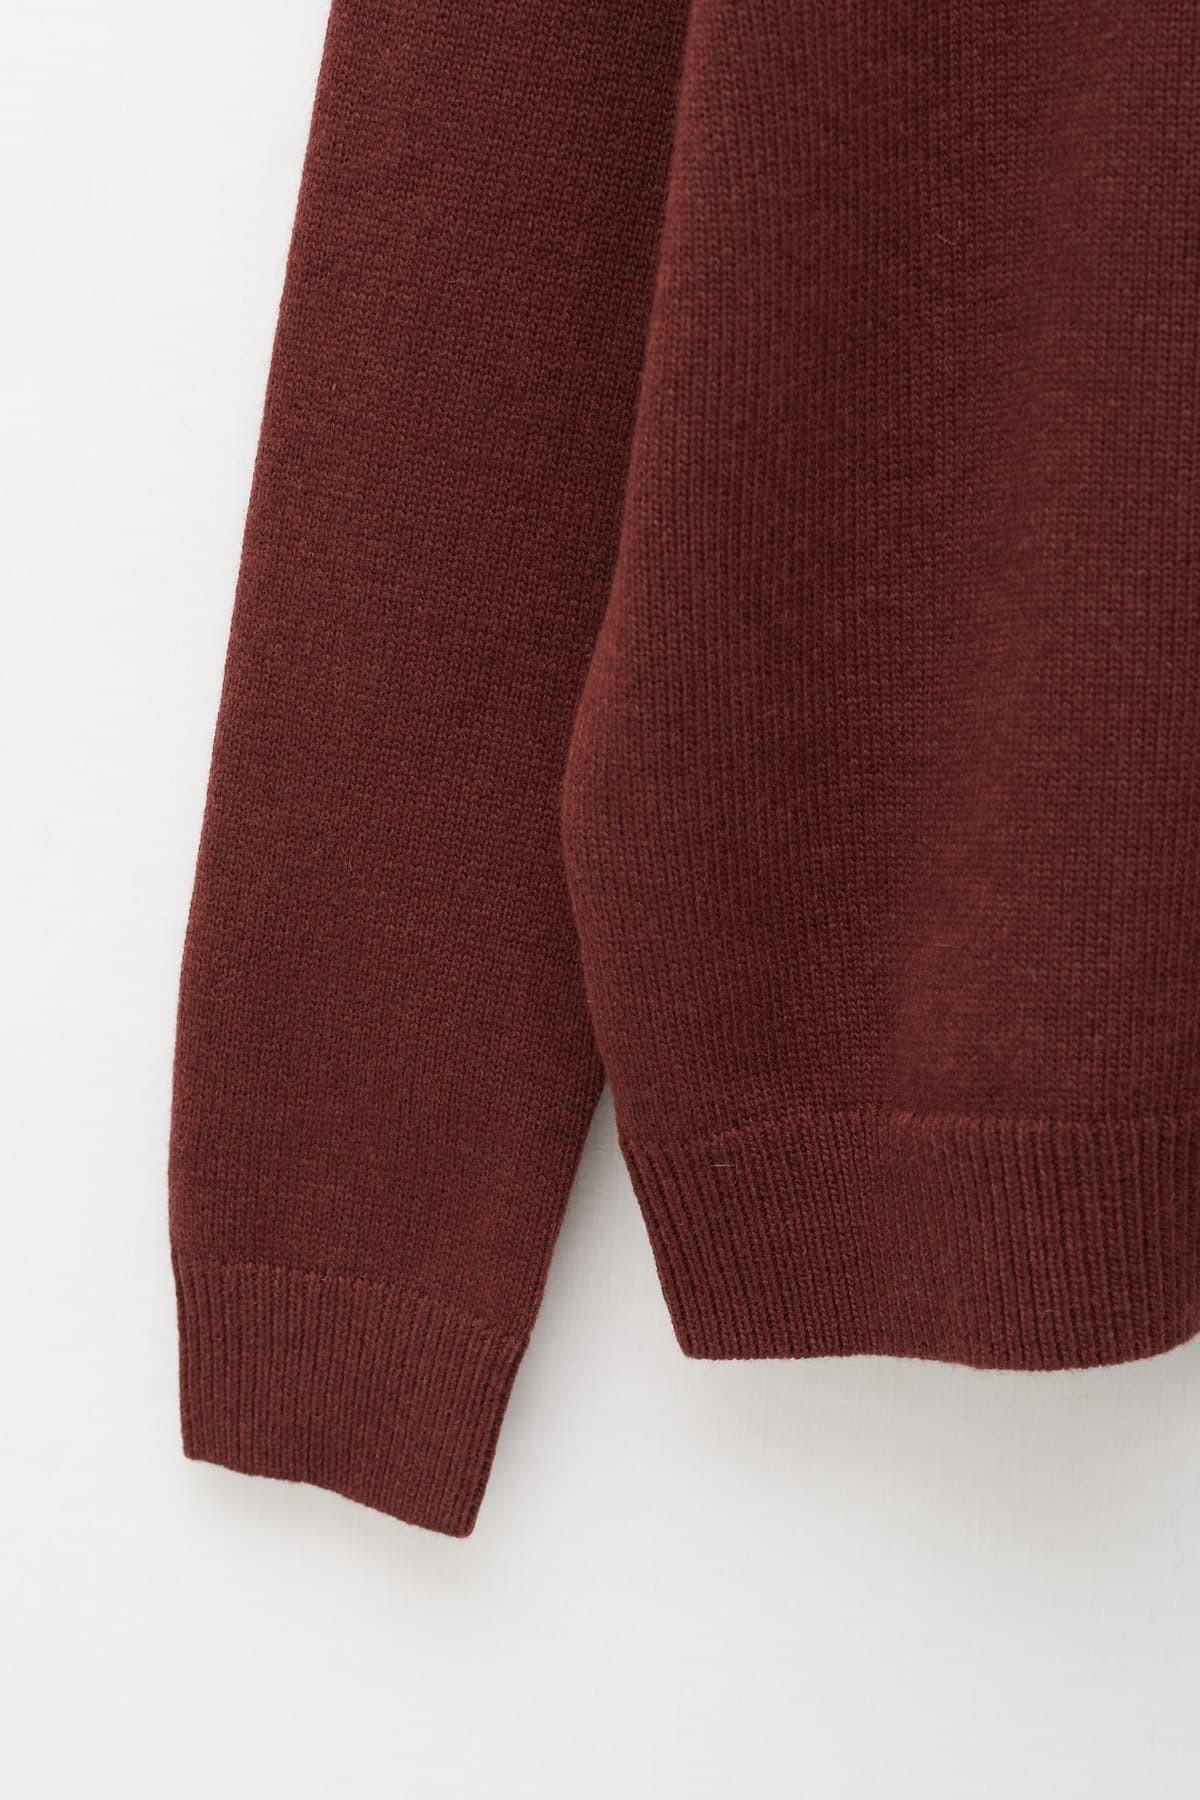 Acne Studios Black Misubi Micro Bag